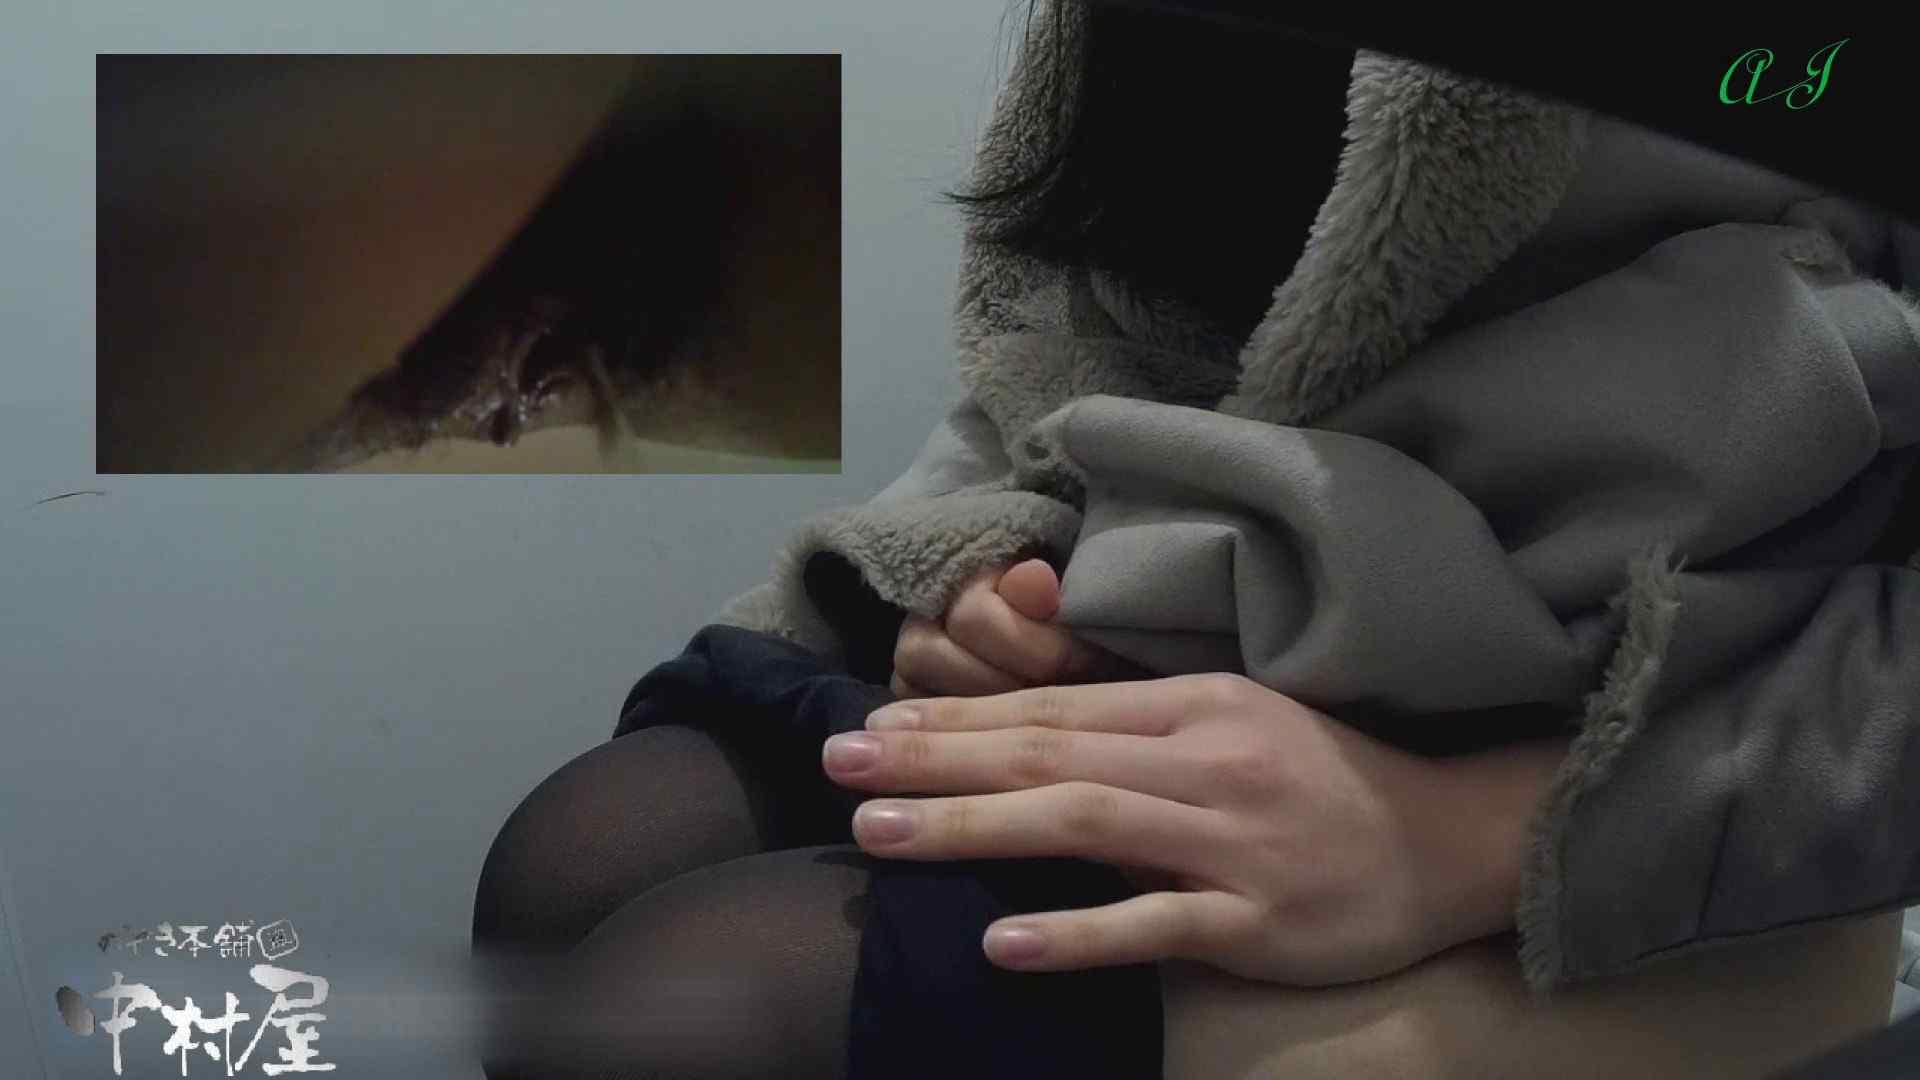 有名大学女性洗面所 vol.79 新アングル丸見え 前編 和式 オマンコ無修正動画無料 81連発 24